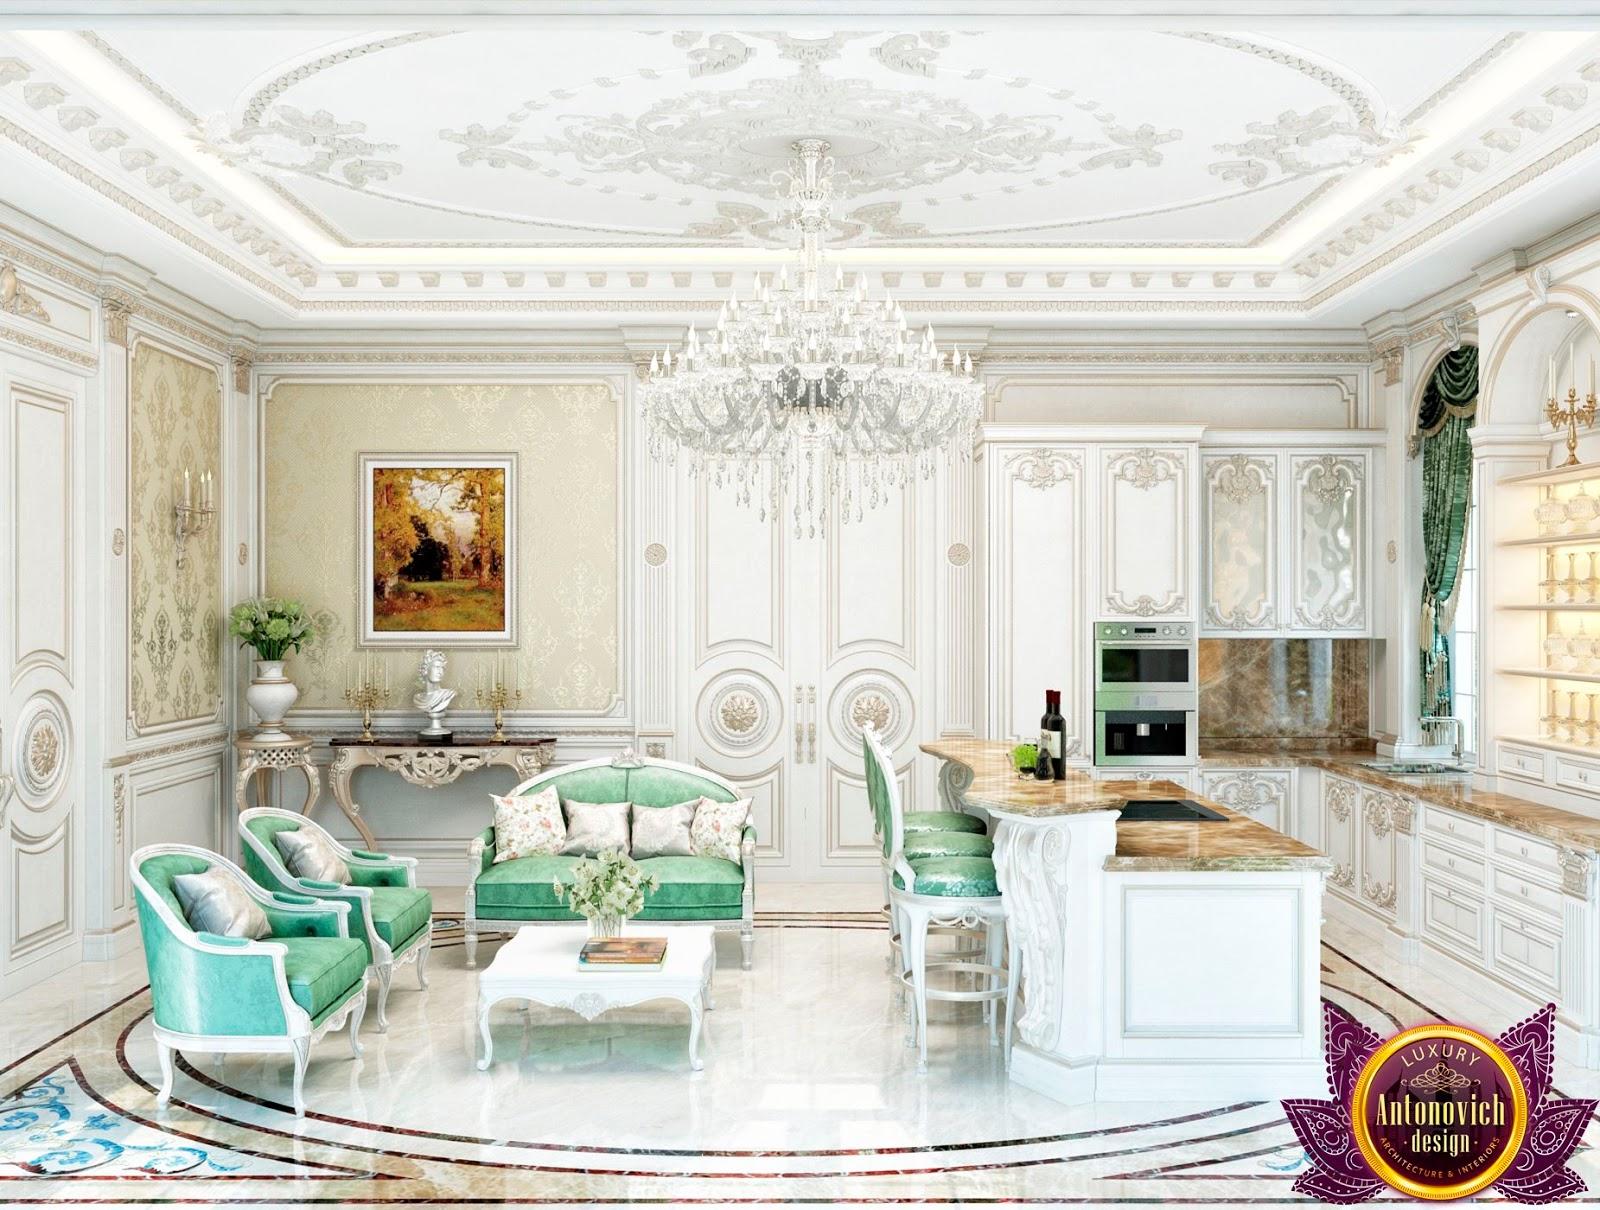 Kitchen Design Usa By Katrina Antonovich: LUXURY ANTONOVICH DESIGN UAE: февраля 2017